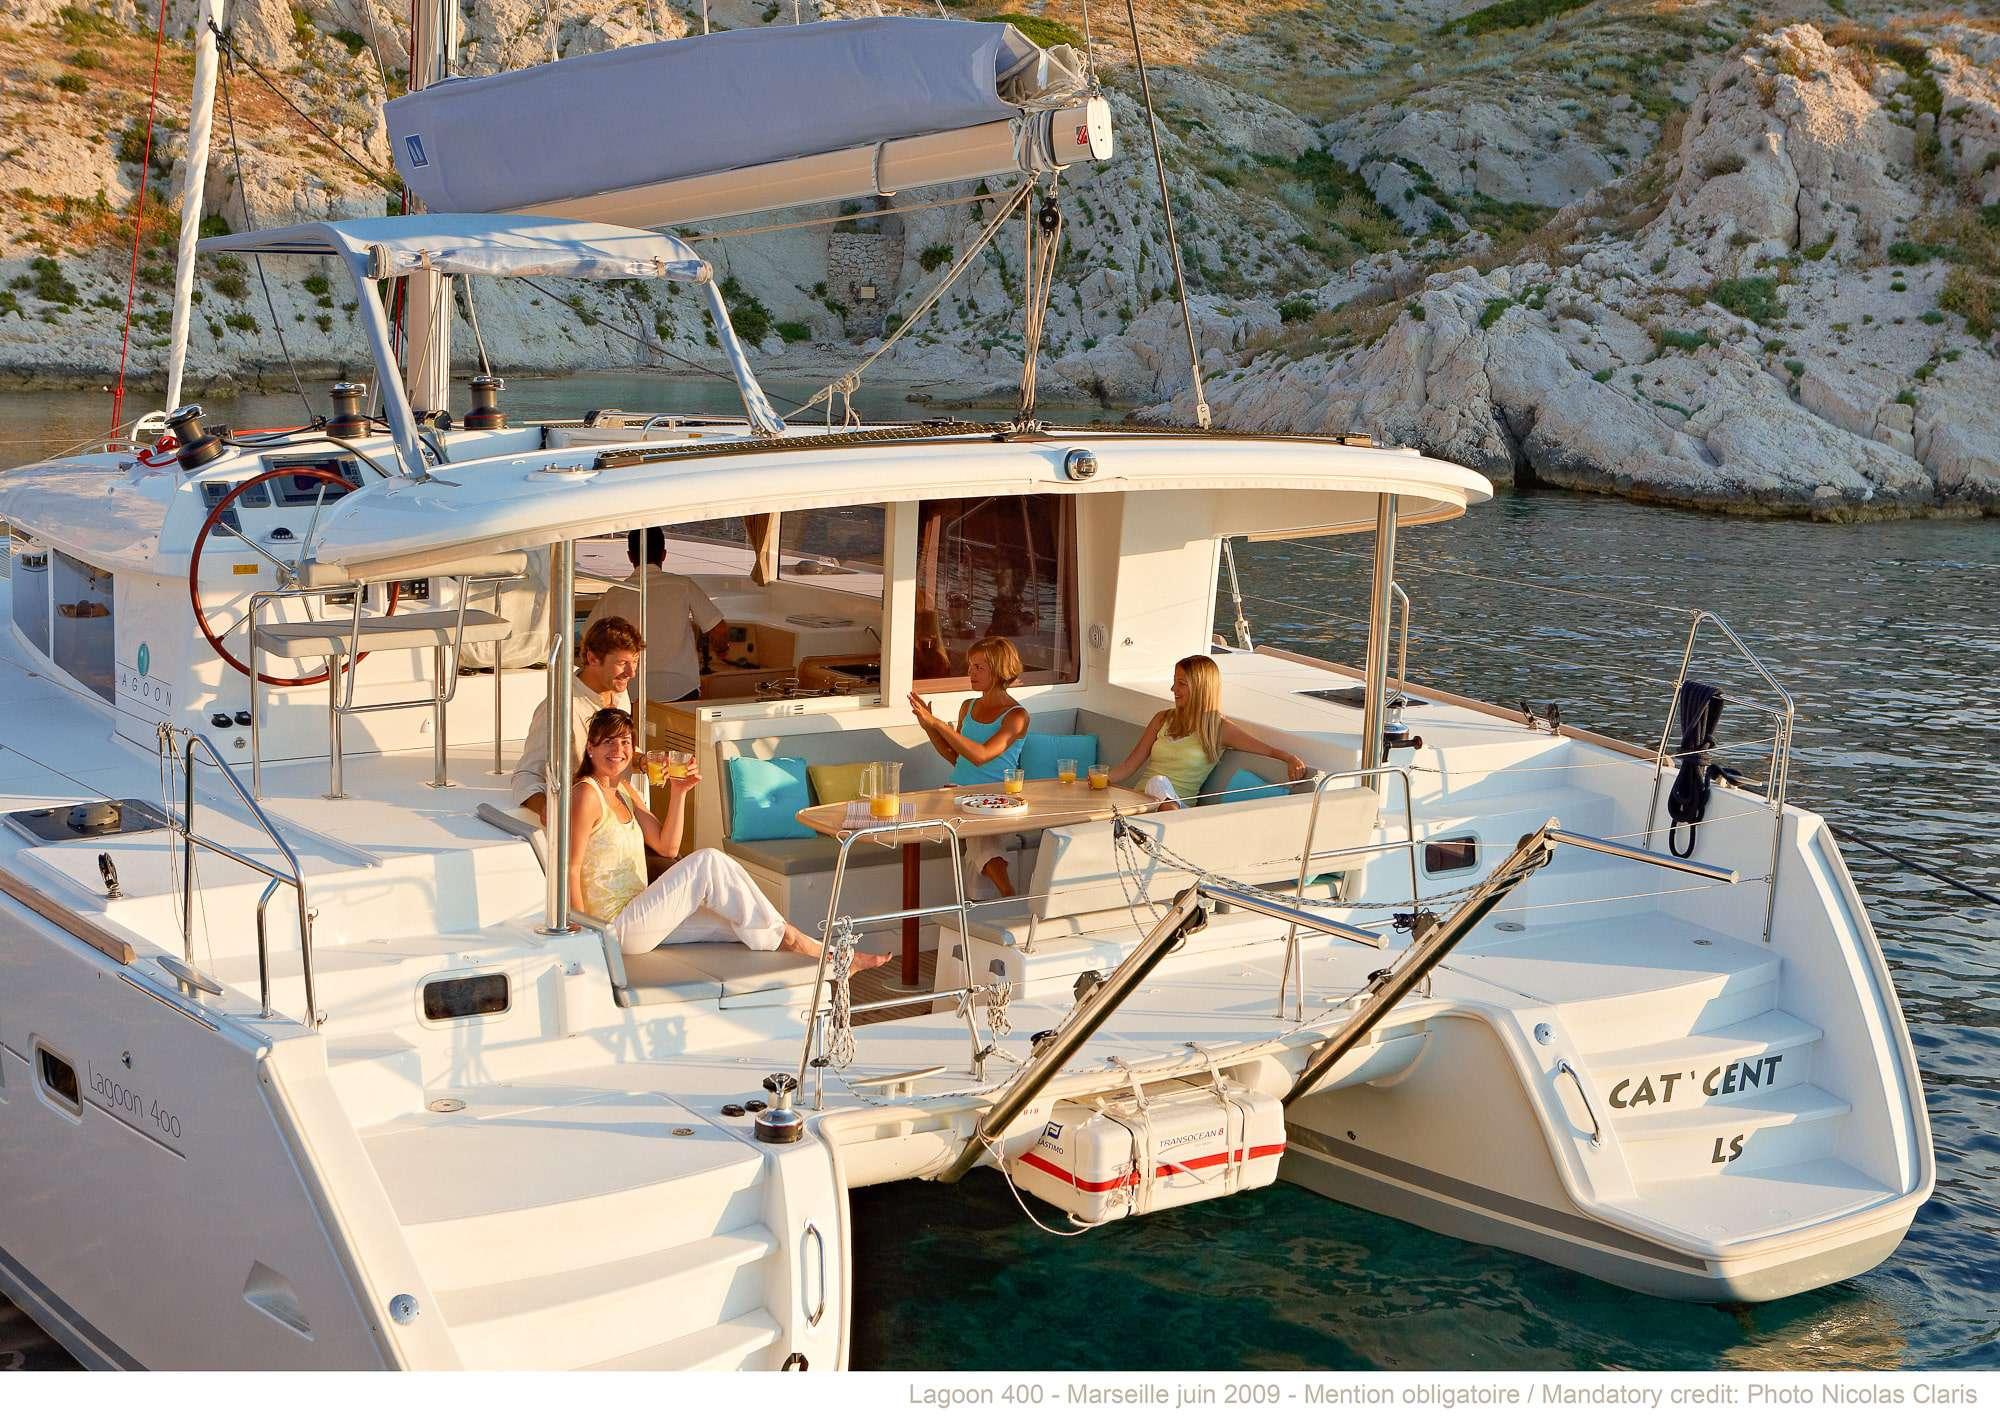 lagoon 400-yacht-charter-croatia-sailing-holidays-croatia-booking-yacht-charter-croatia-catamarans-sailboats-motorboats-gulets-luxury-yachts-boat-rental-croatia 13